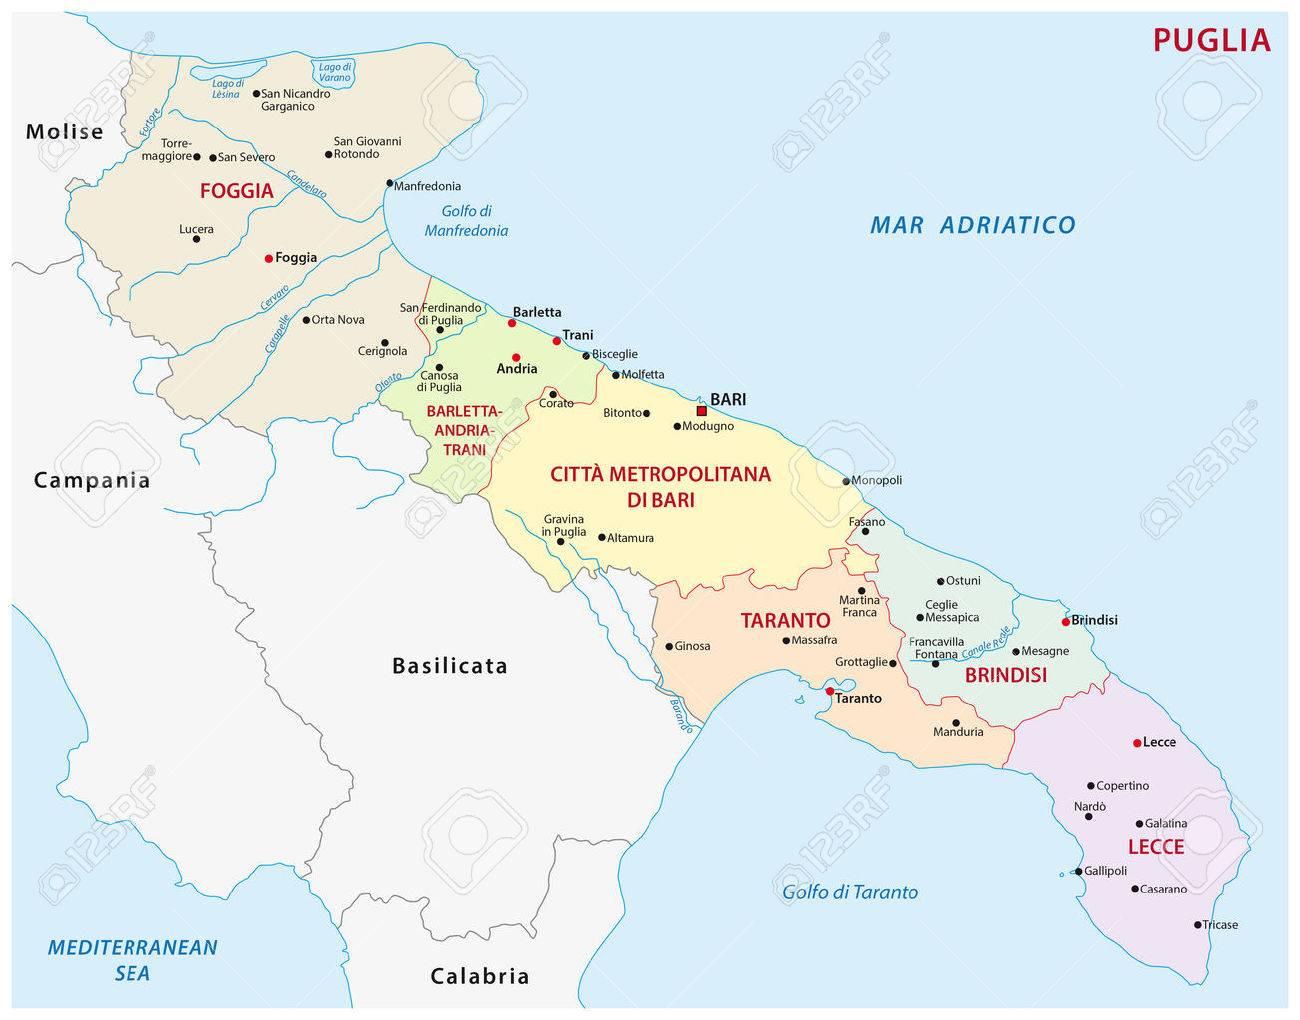 Apulia Administrative Map Italy Royalty Free Cliparts Vectors And